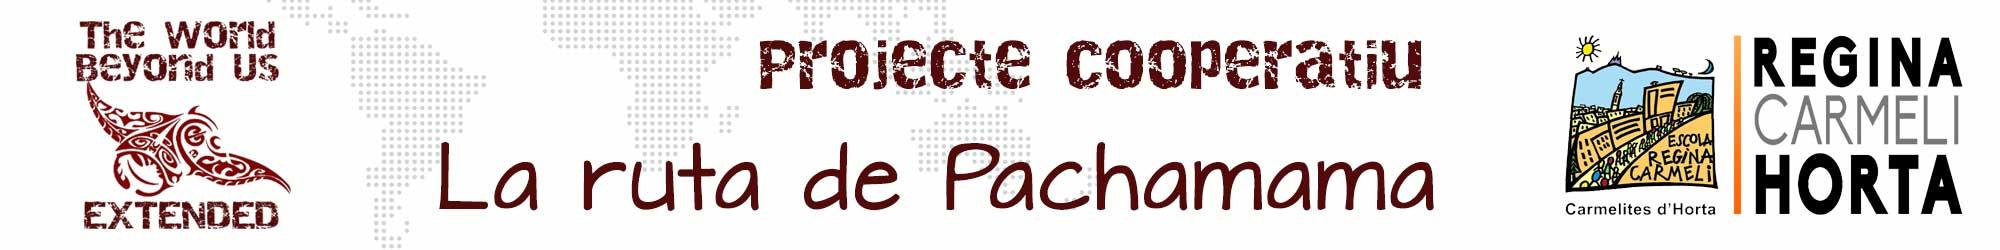 pachamama-escola-regina-carmeli-horta-v2